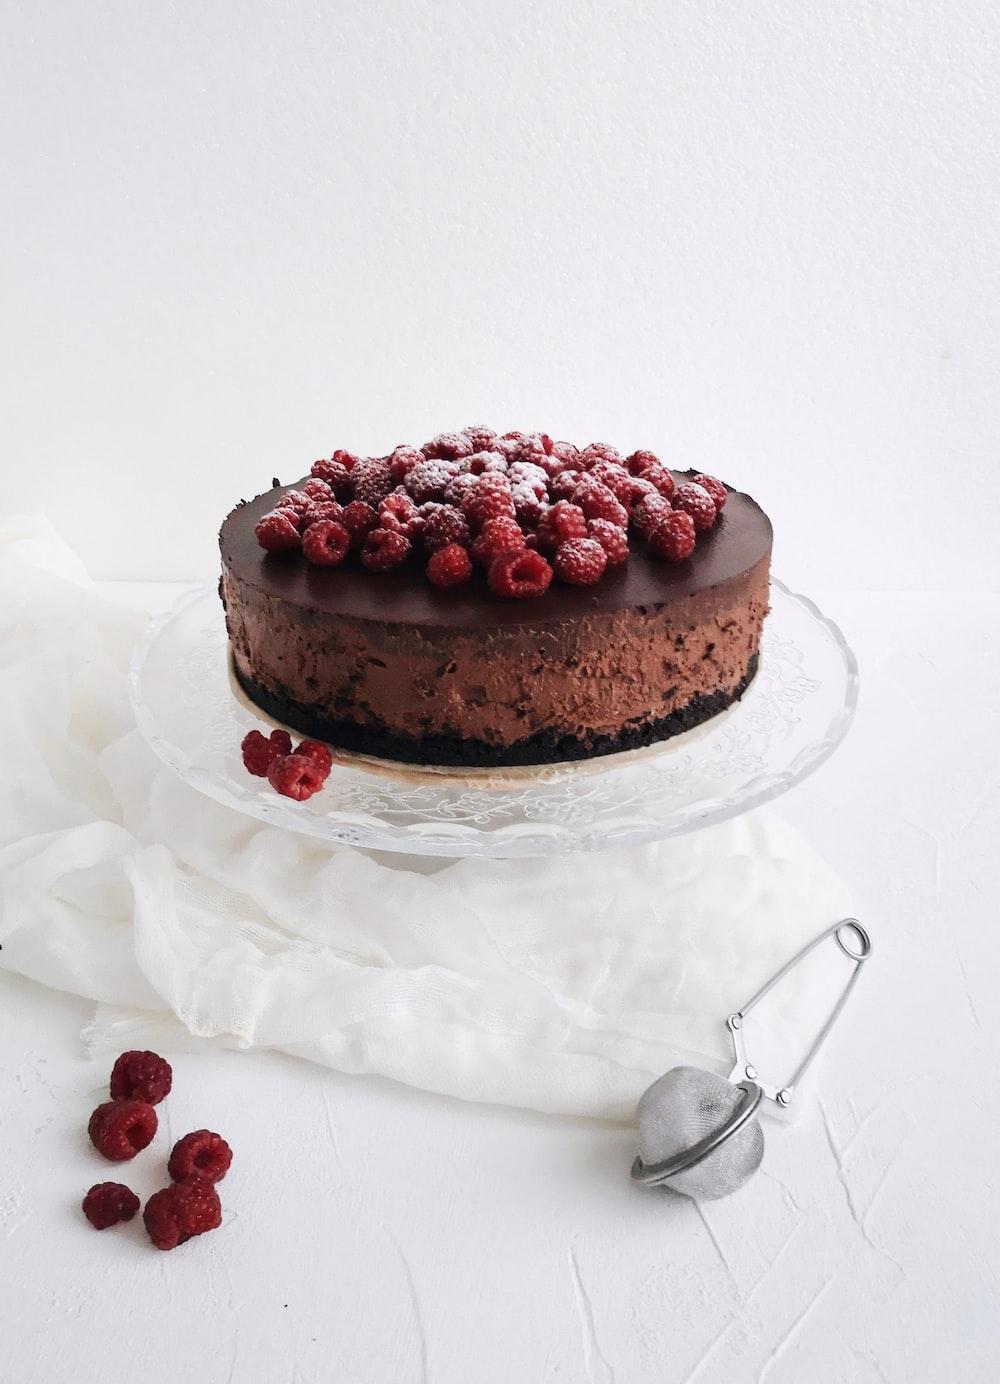 round baked cake close-up photography